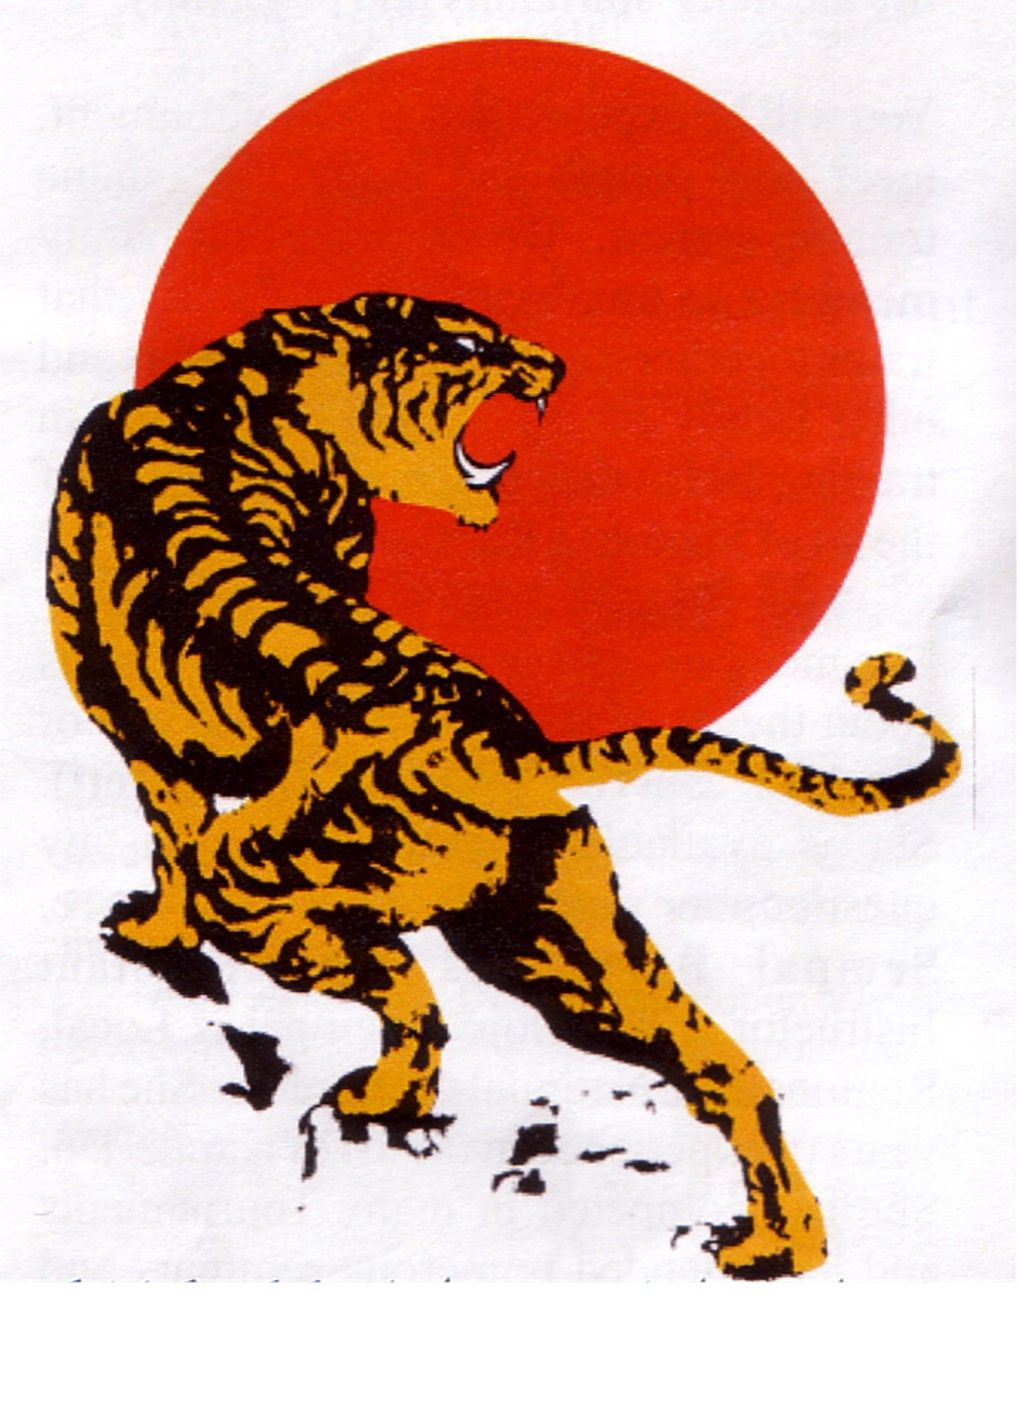 Shotokan Tiger Moon Patch Clipart - Free Clip Art Images